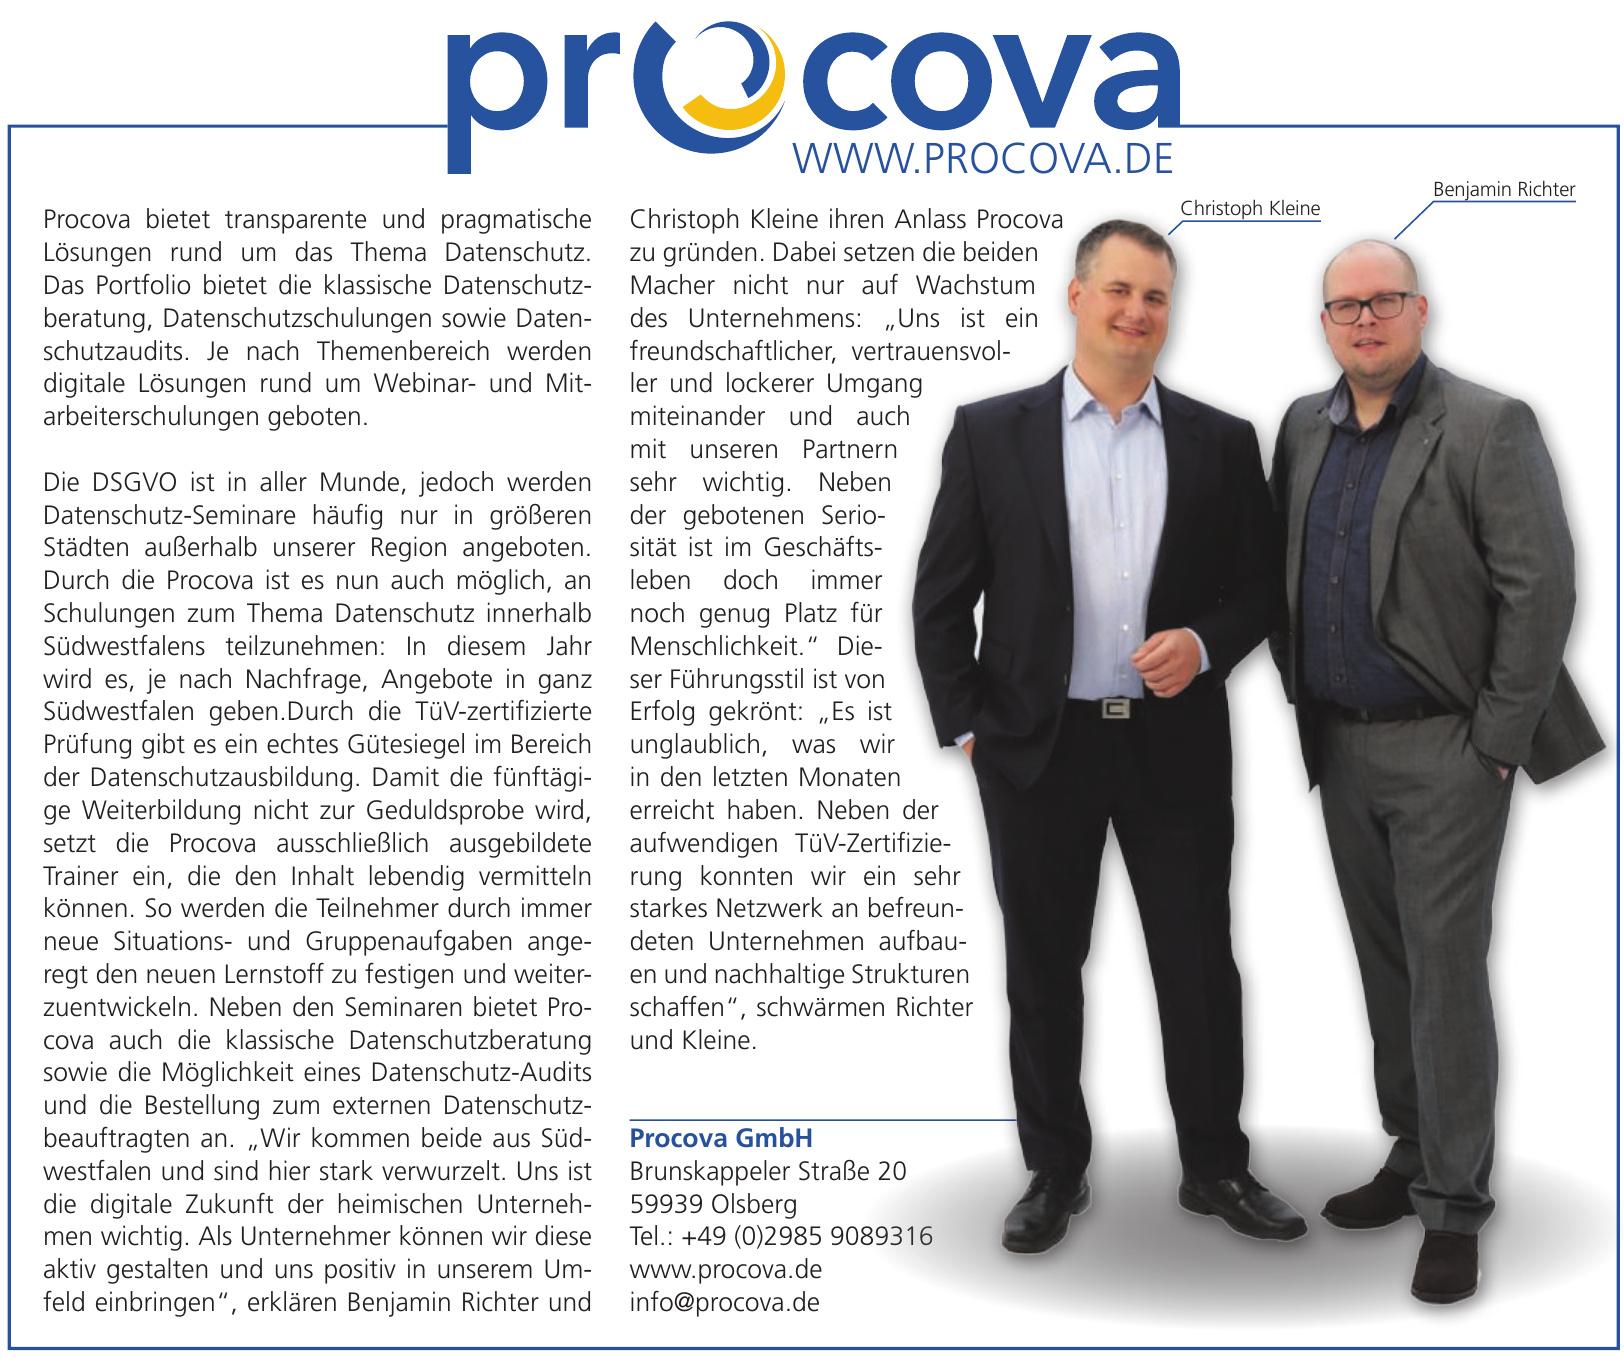 Procova GmbH